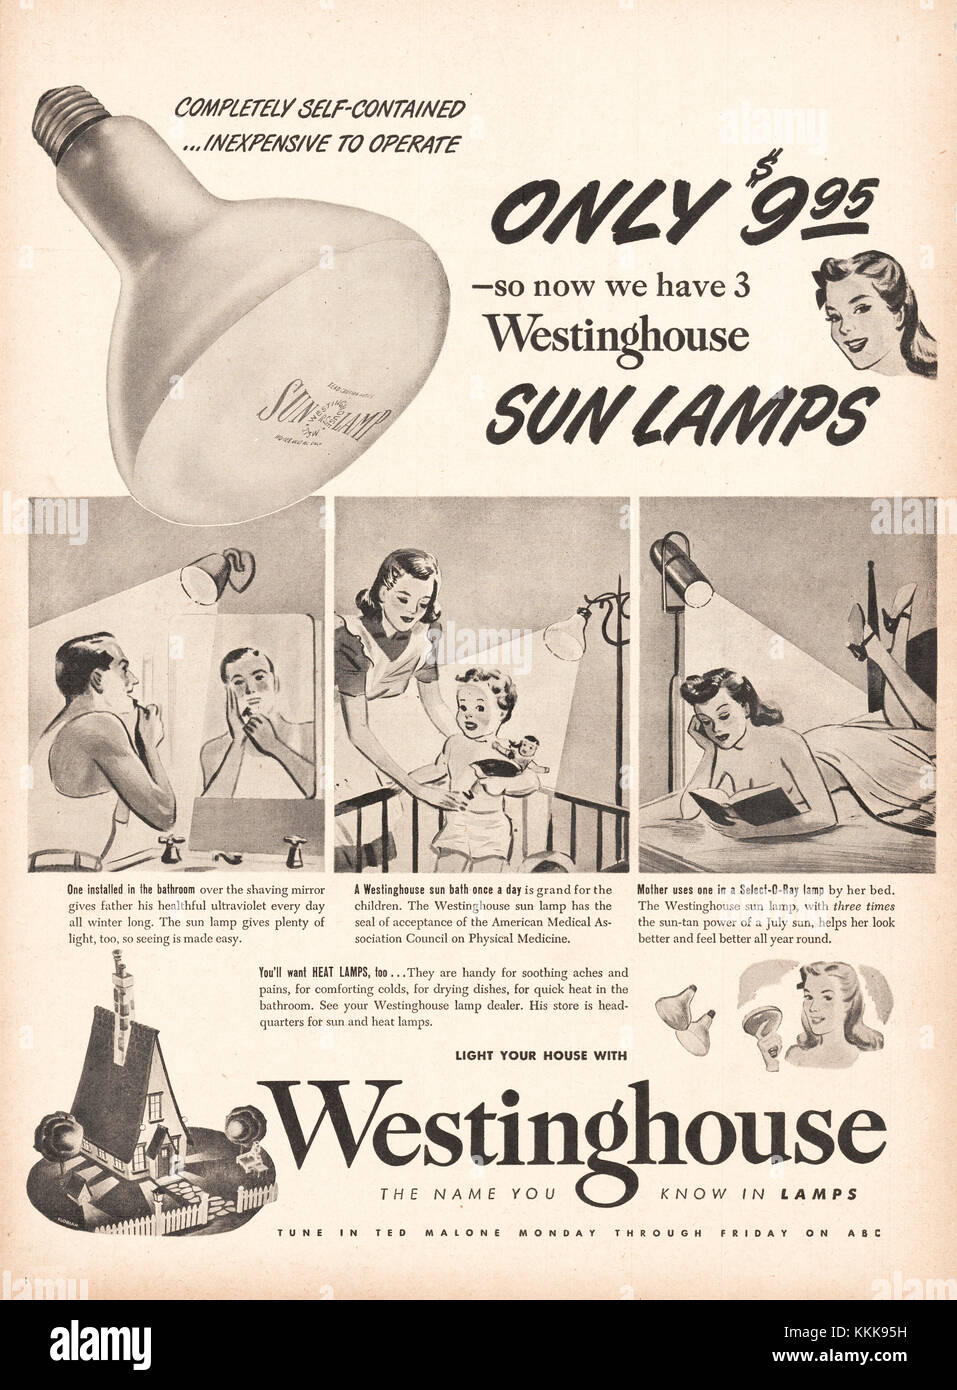 1947 U.S. Magazine Westinghouse Sun Lamps Advert